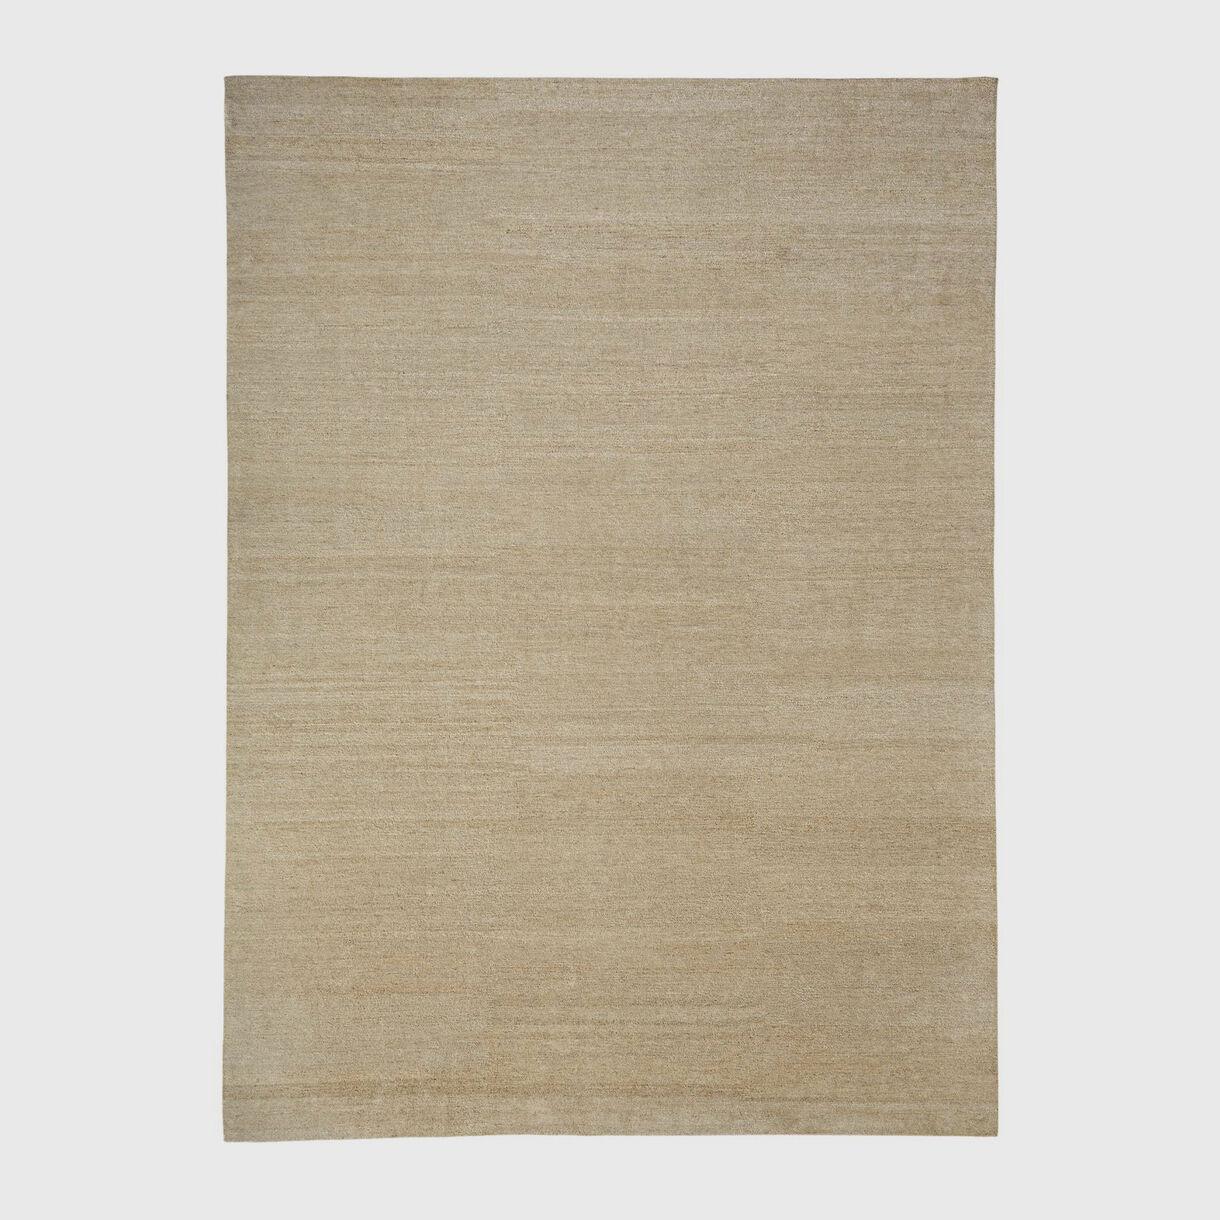 Legends of Carpets, Imole